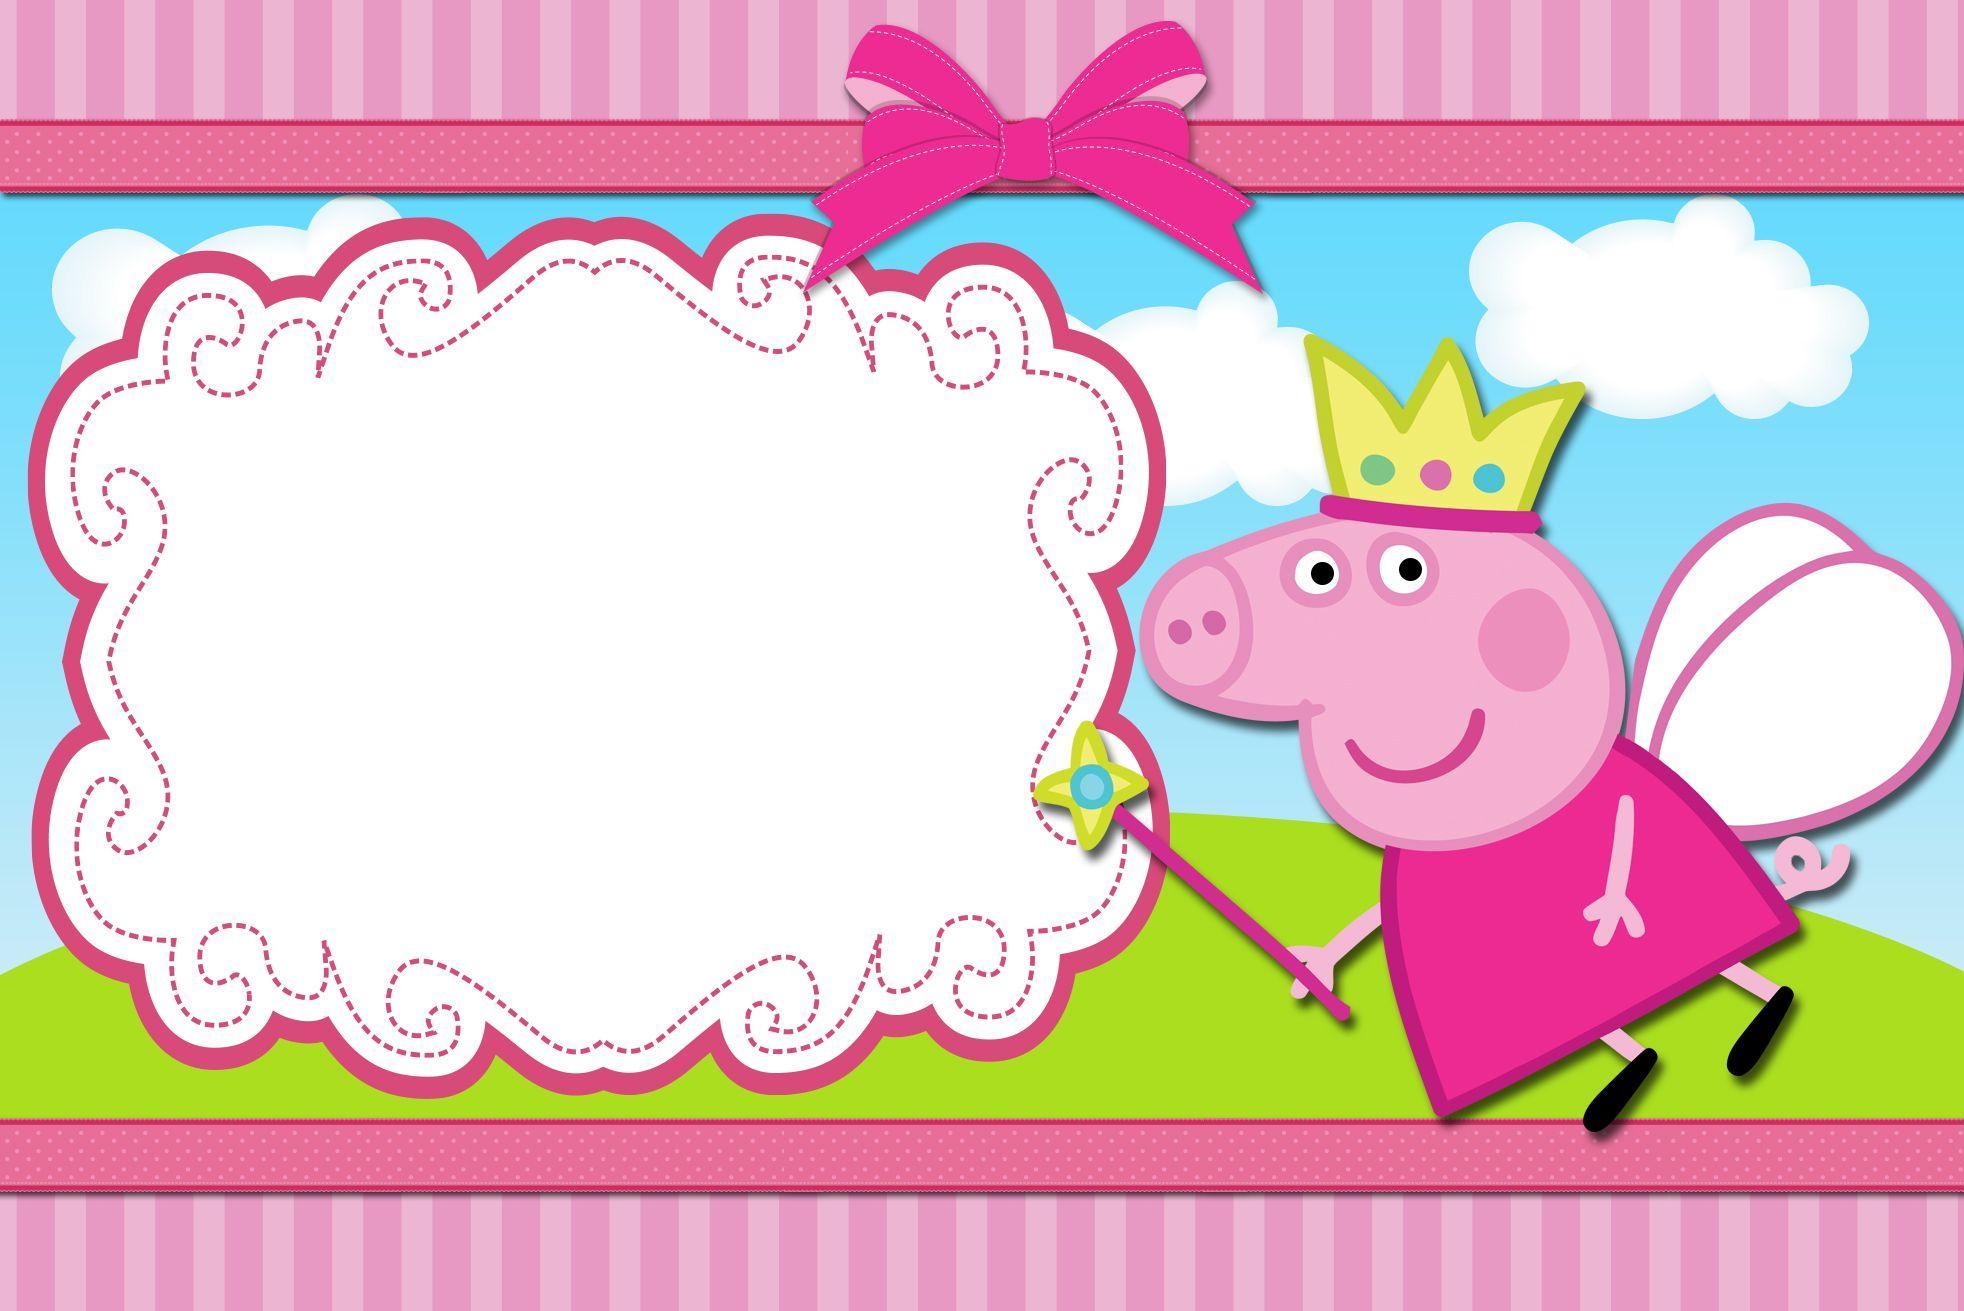 Peppa Pig Wallpapers - Wallpaper Cave